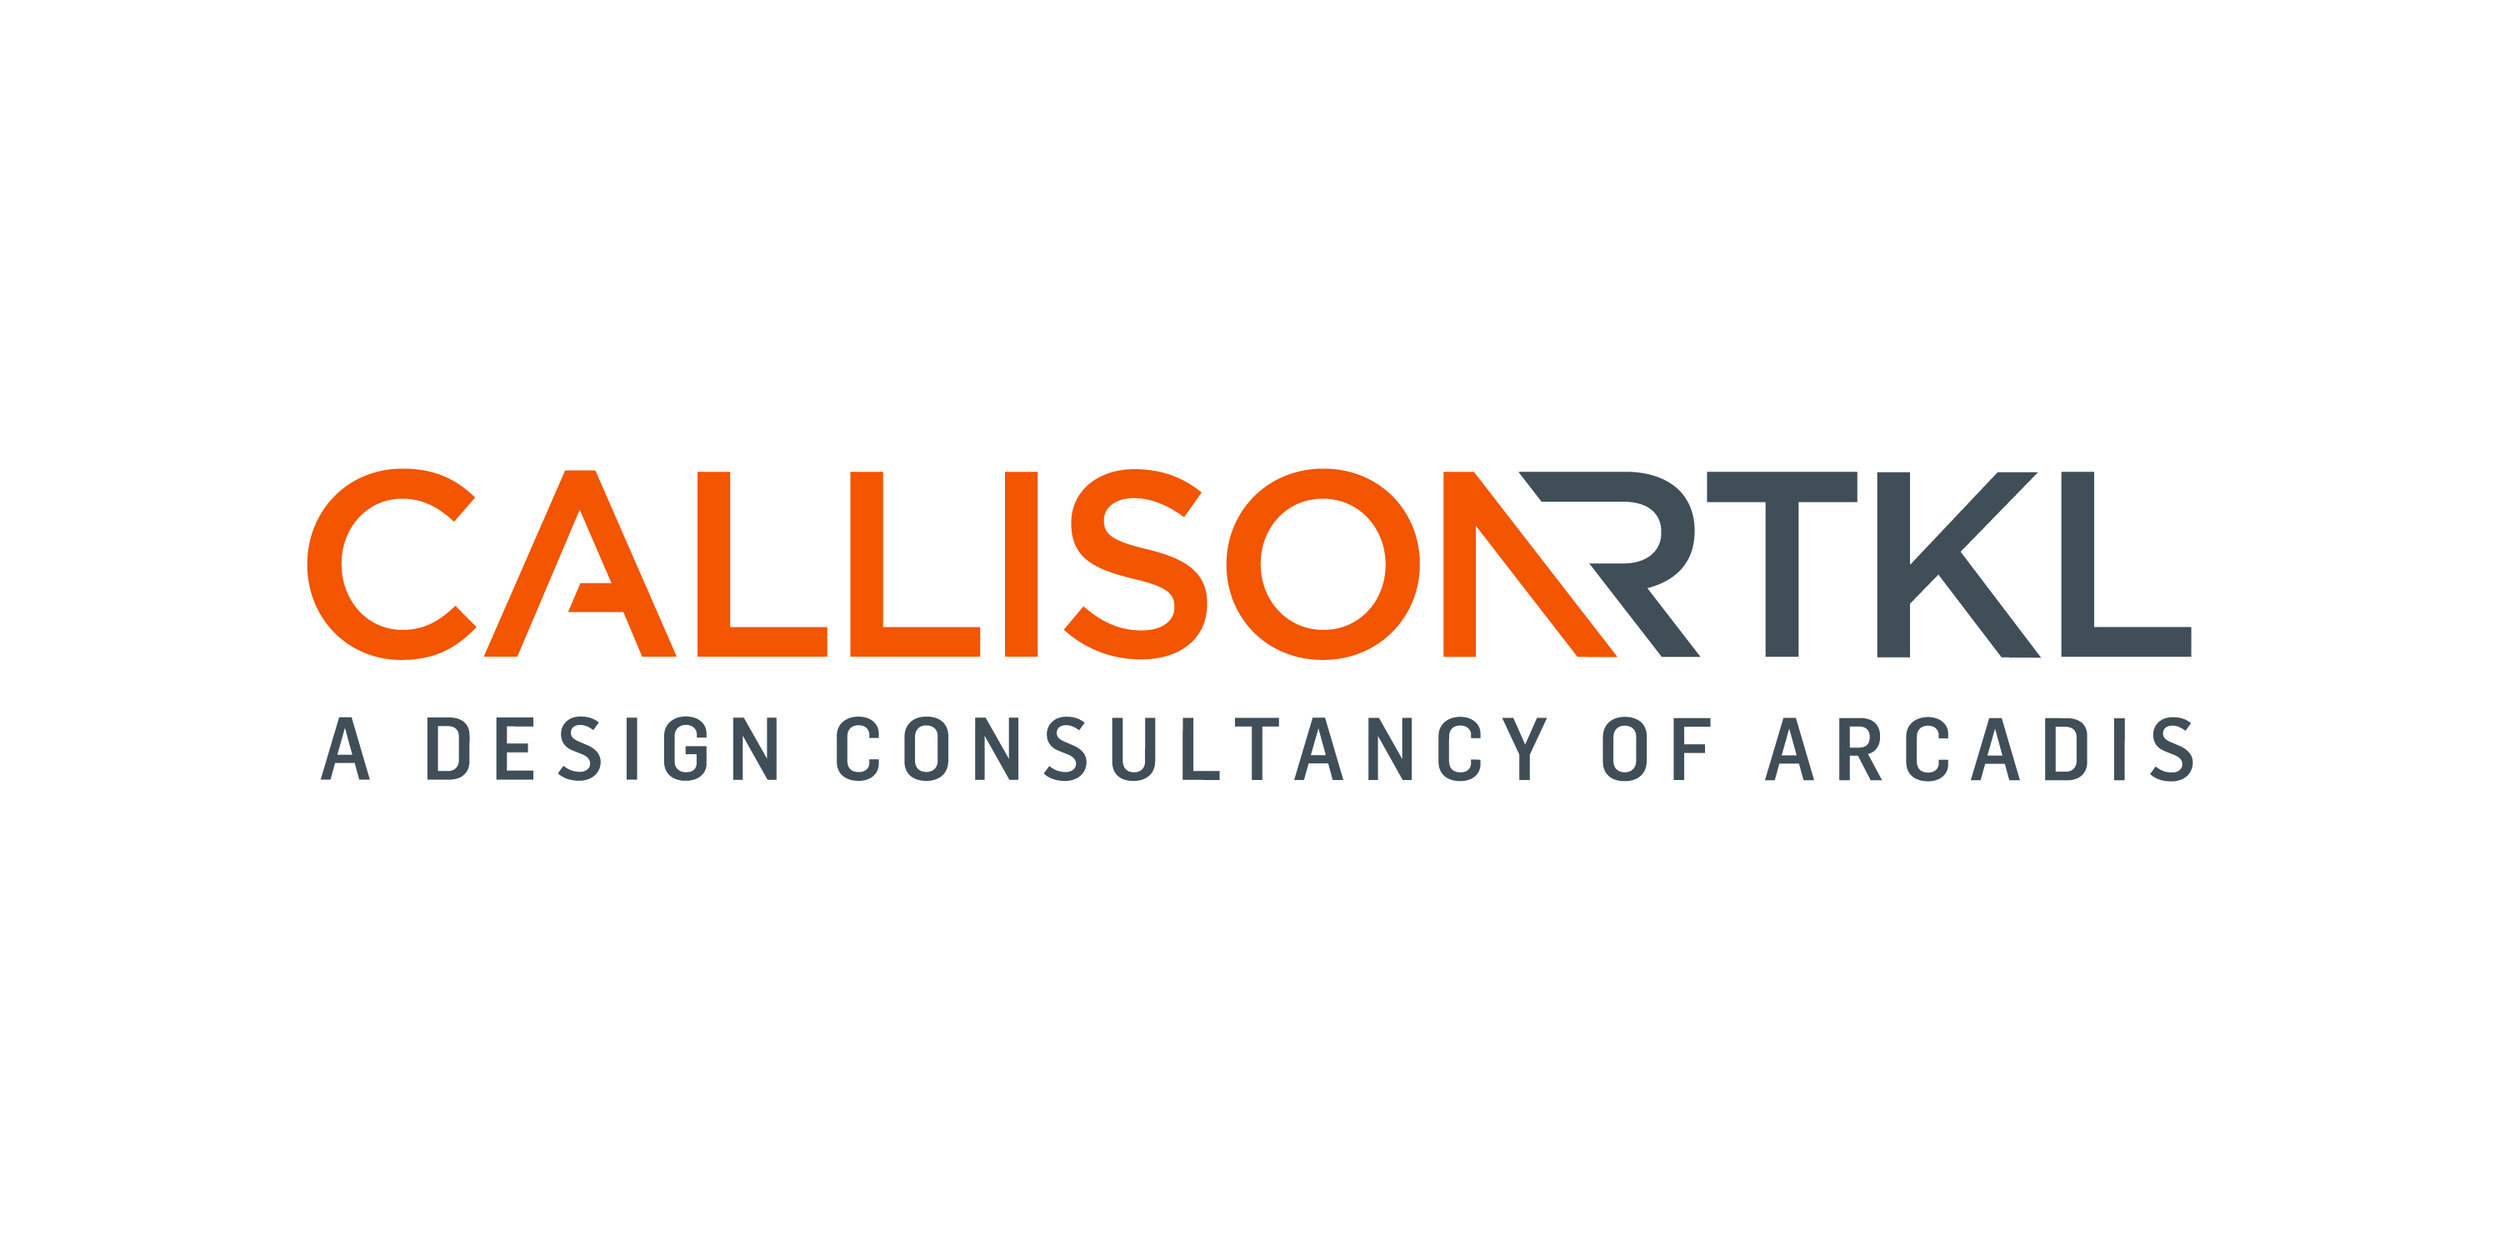 CallisonRTKL_CorporateIdentity_Logo_160422.jpg